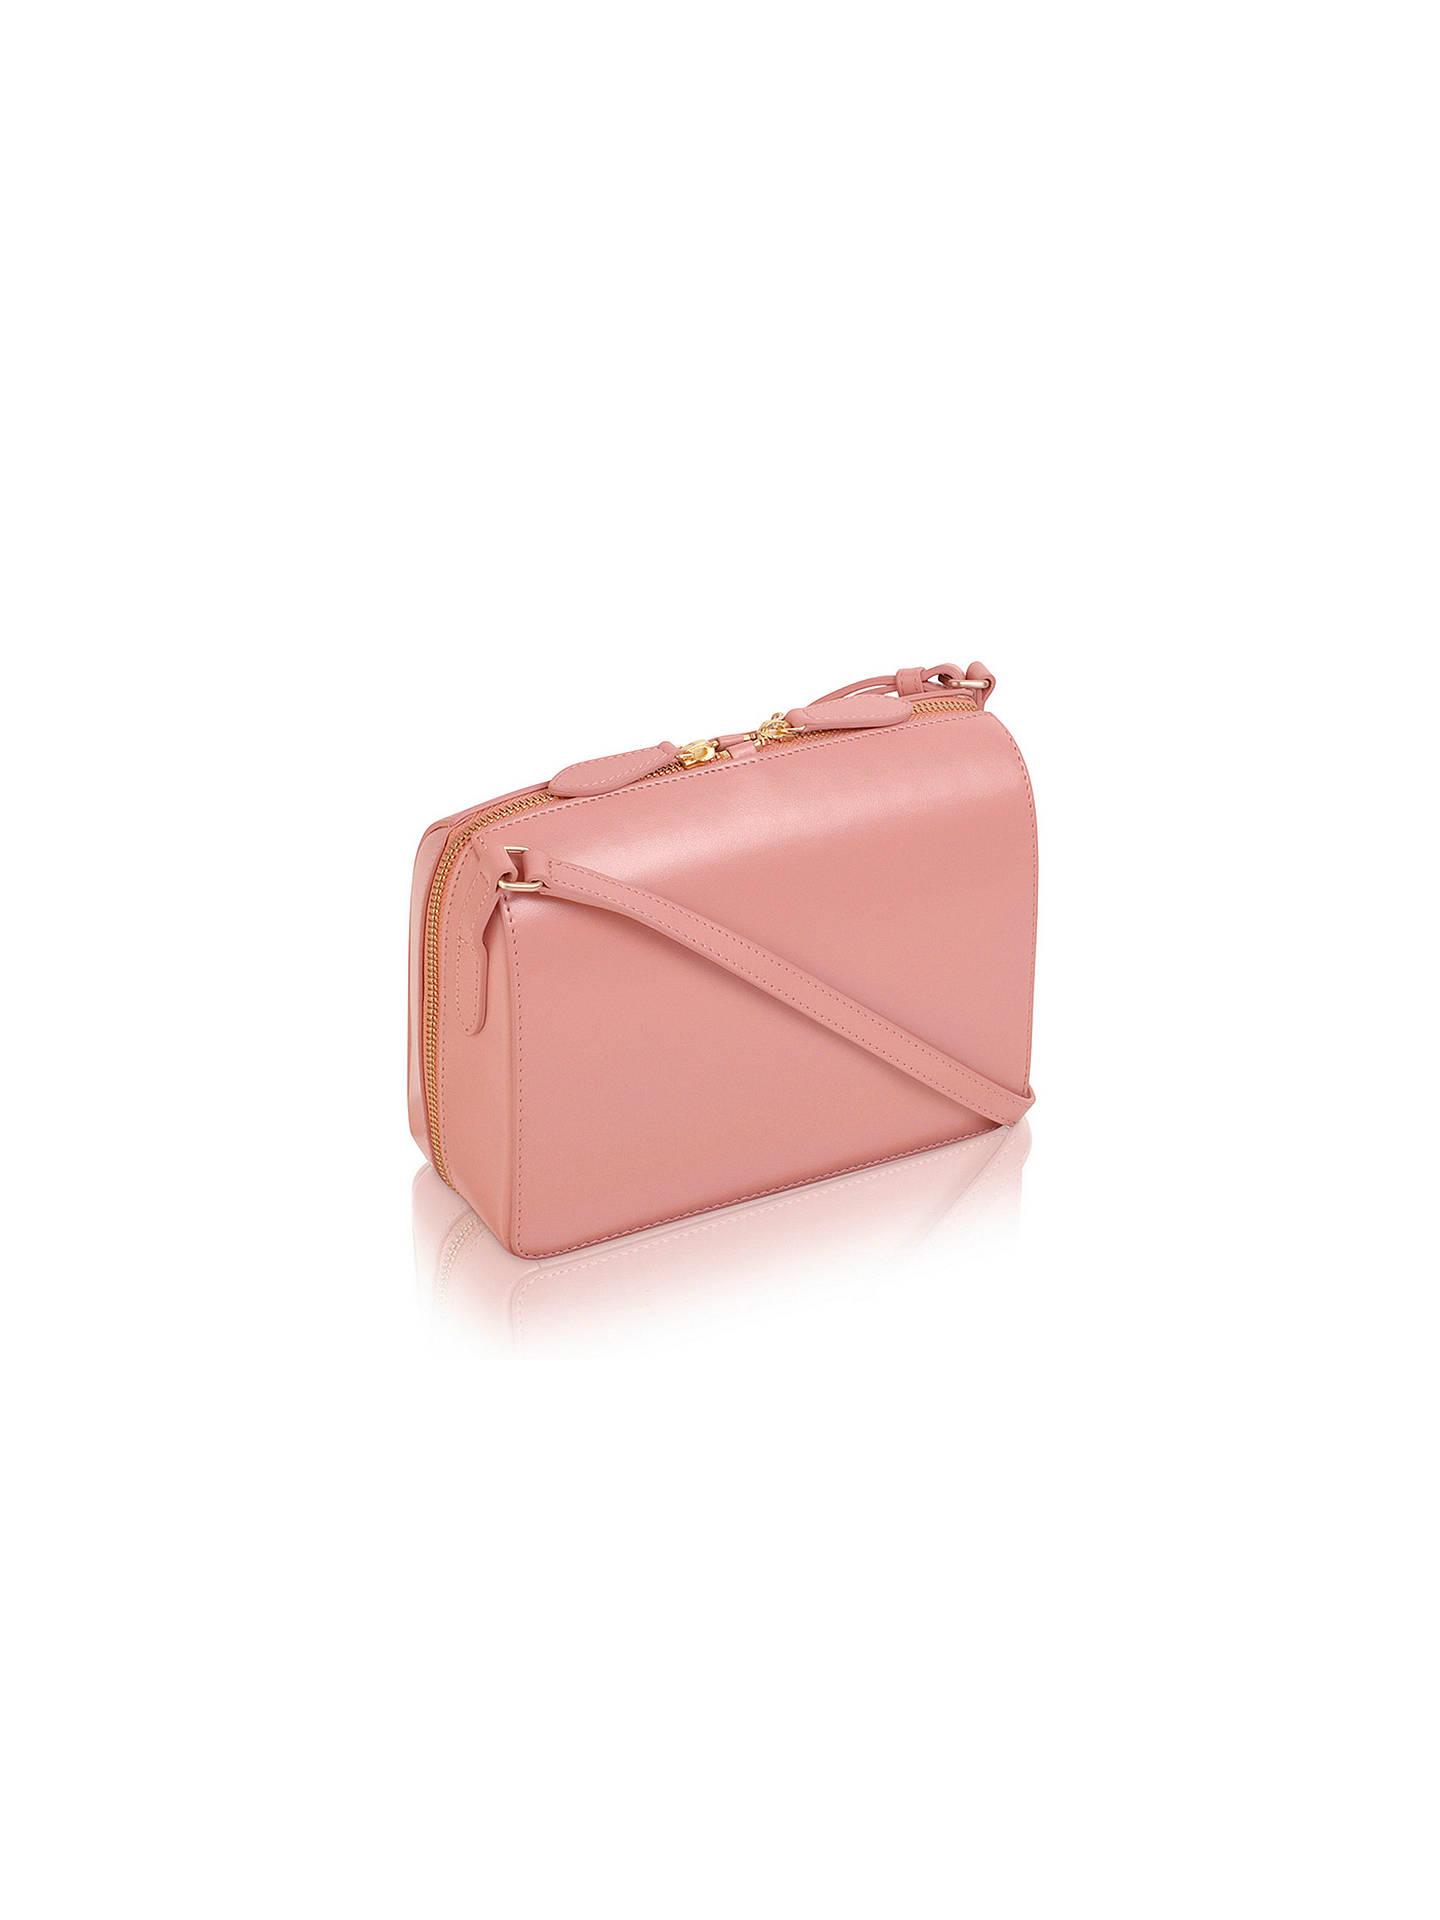 1030d95e0eb0 ... BuyRadley Keats Grove Small Leather Acrossbody Bag